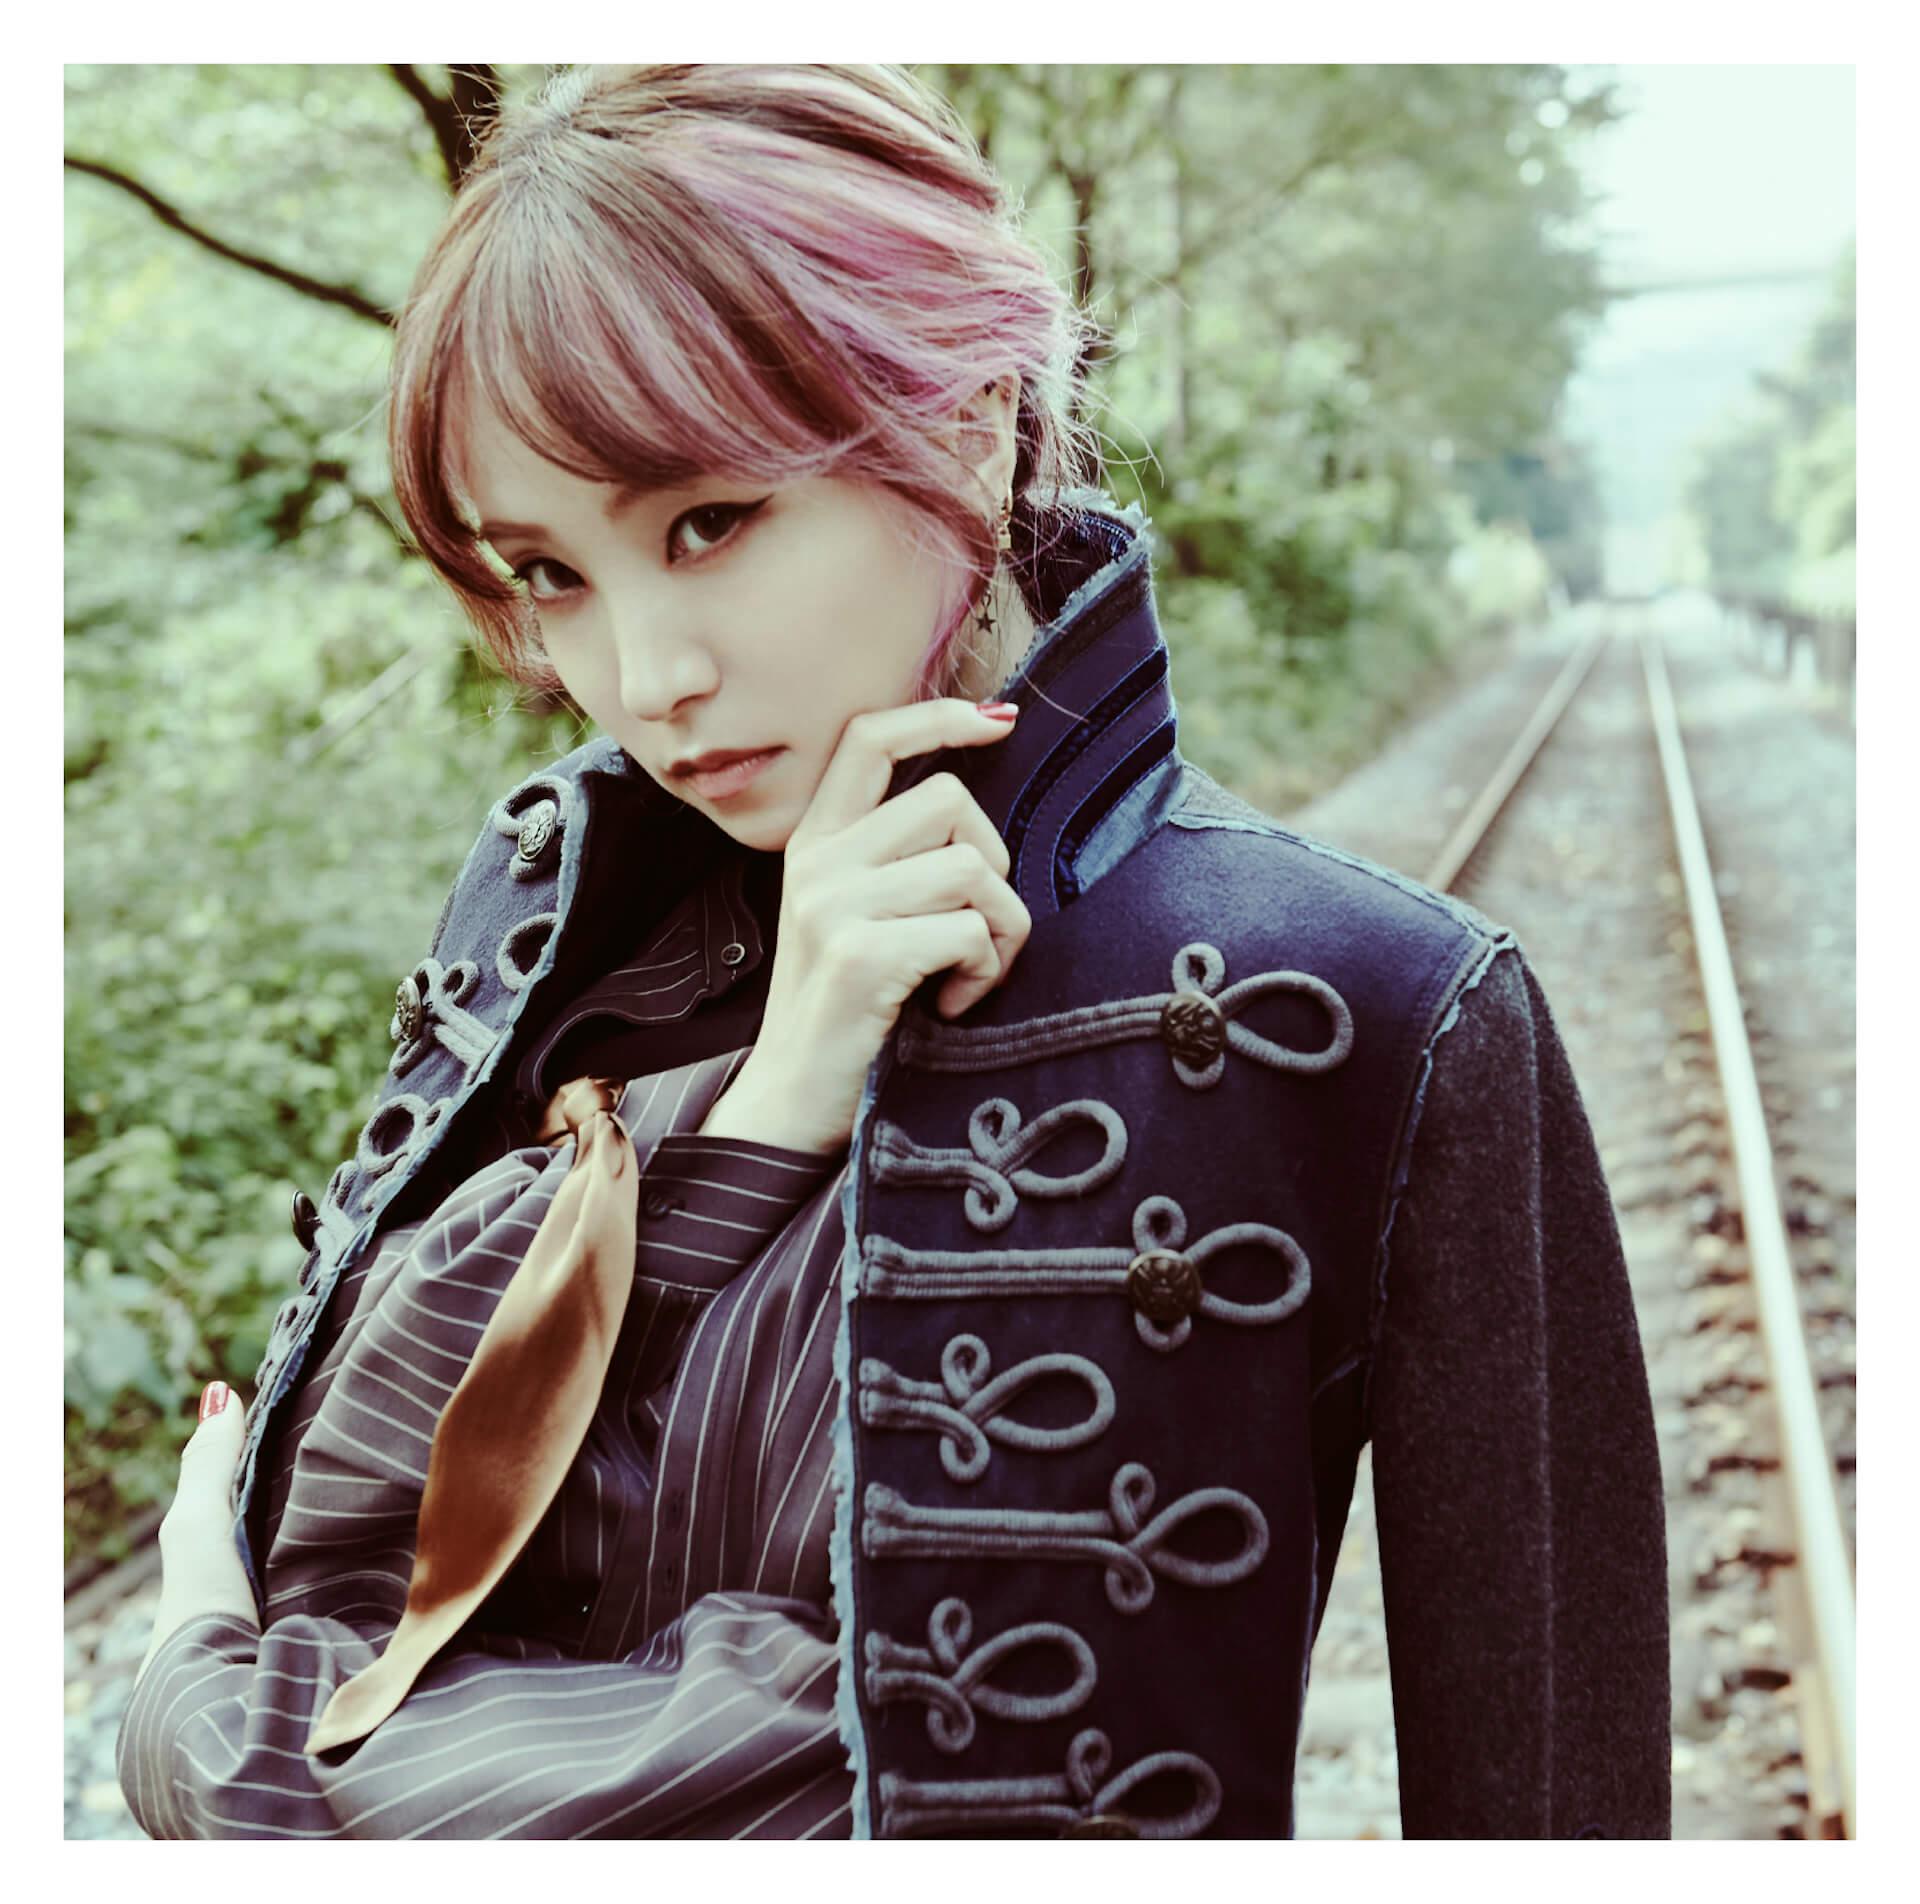 "LiSAによる『劇場版「鬼滅の刃」無限列車編』主題歌""炎""がシングルリリース決定&MVも公開!大ヒット曲""紅蓮華""を収録したアルバム『LEO-NiNE』も発表 music201013_kimetsunoyaiba_lisa_8"